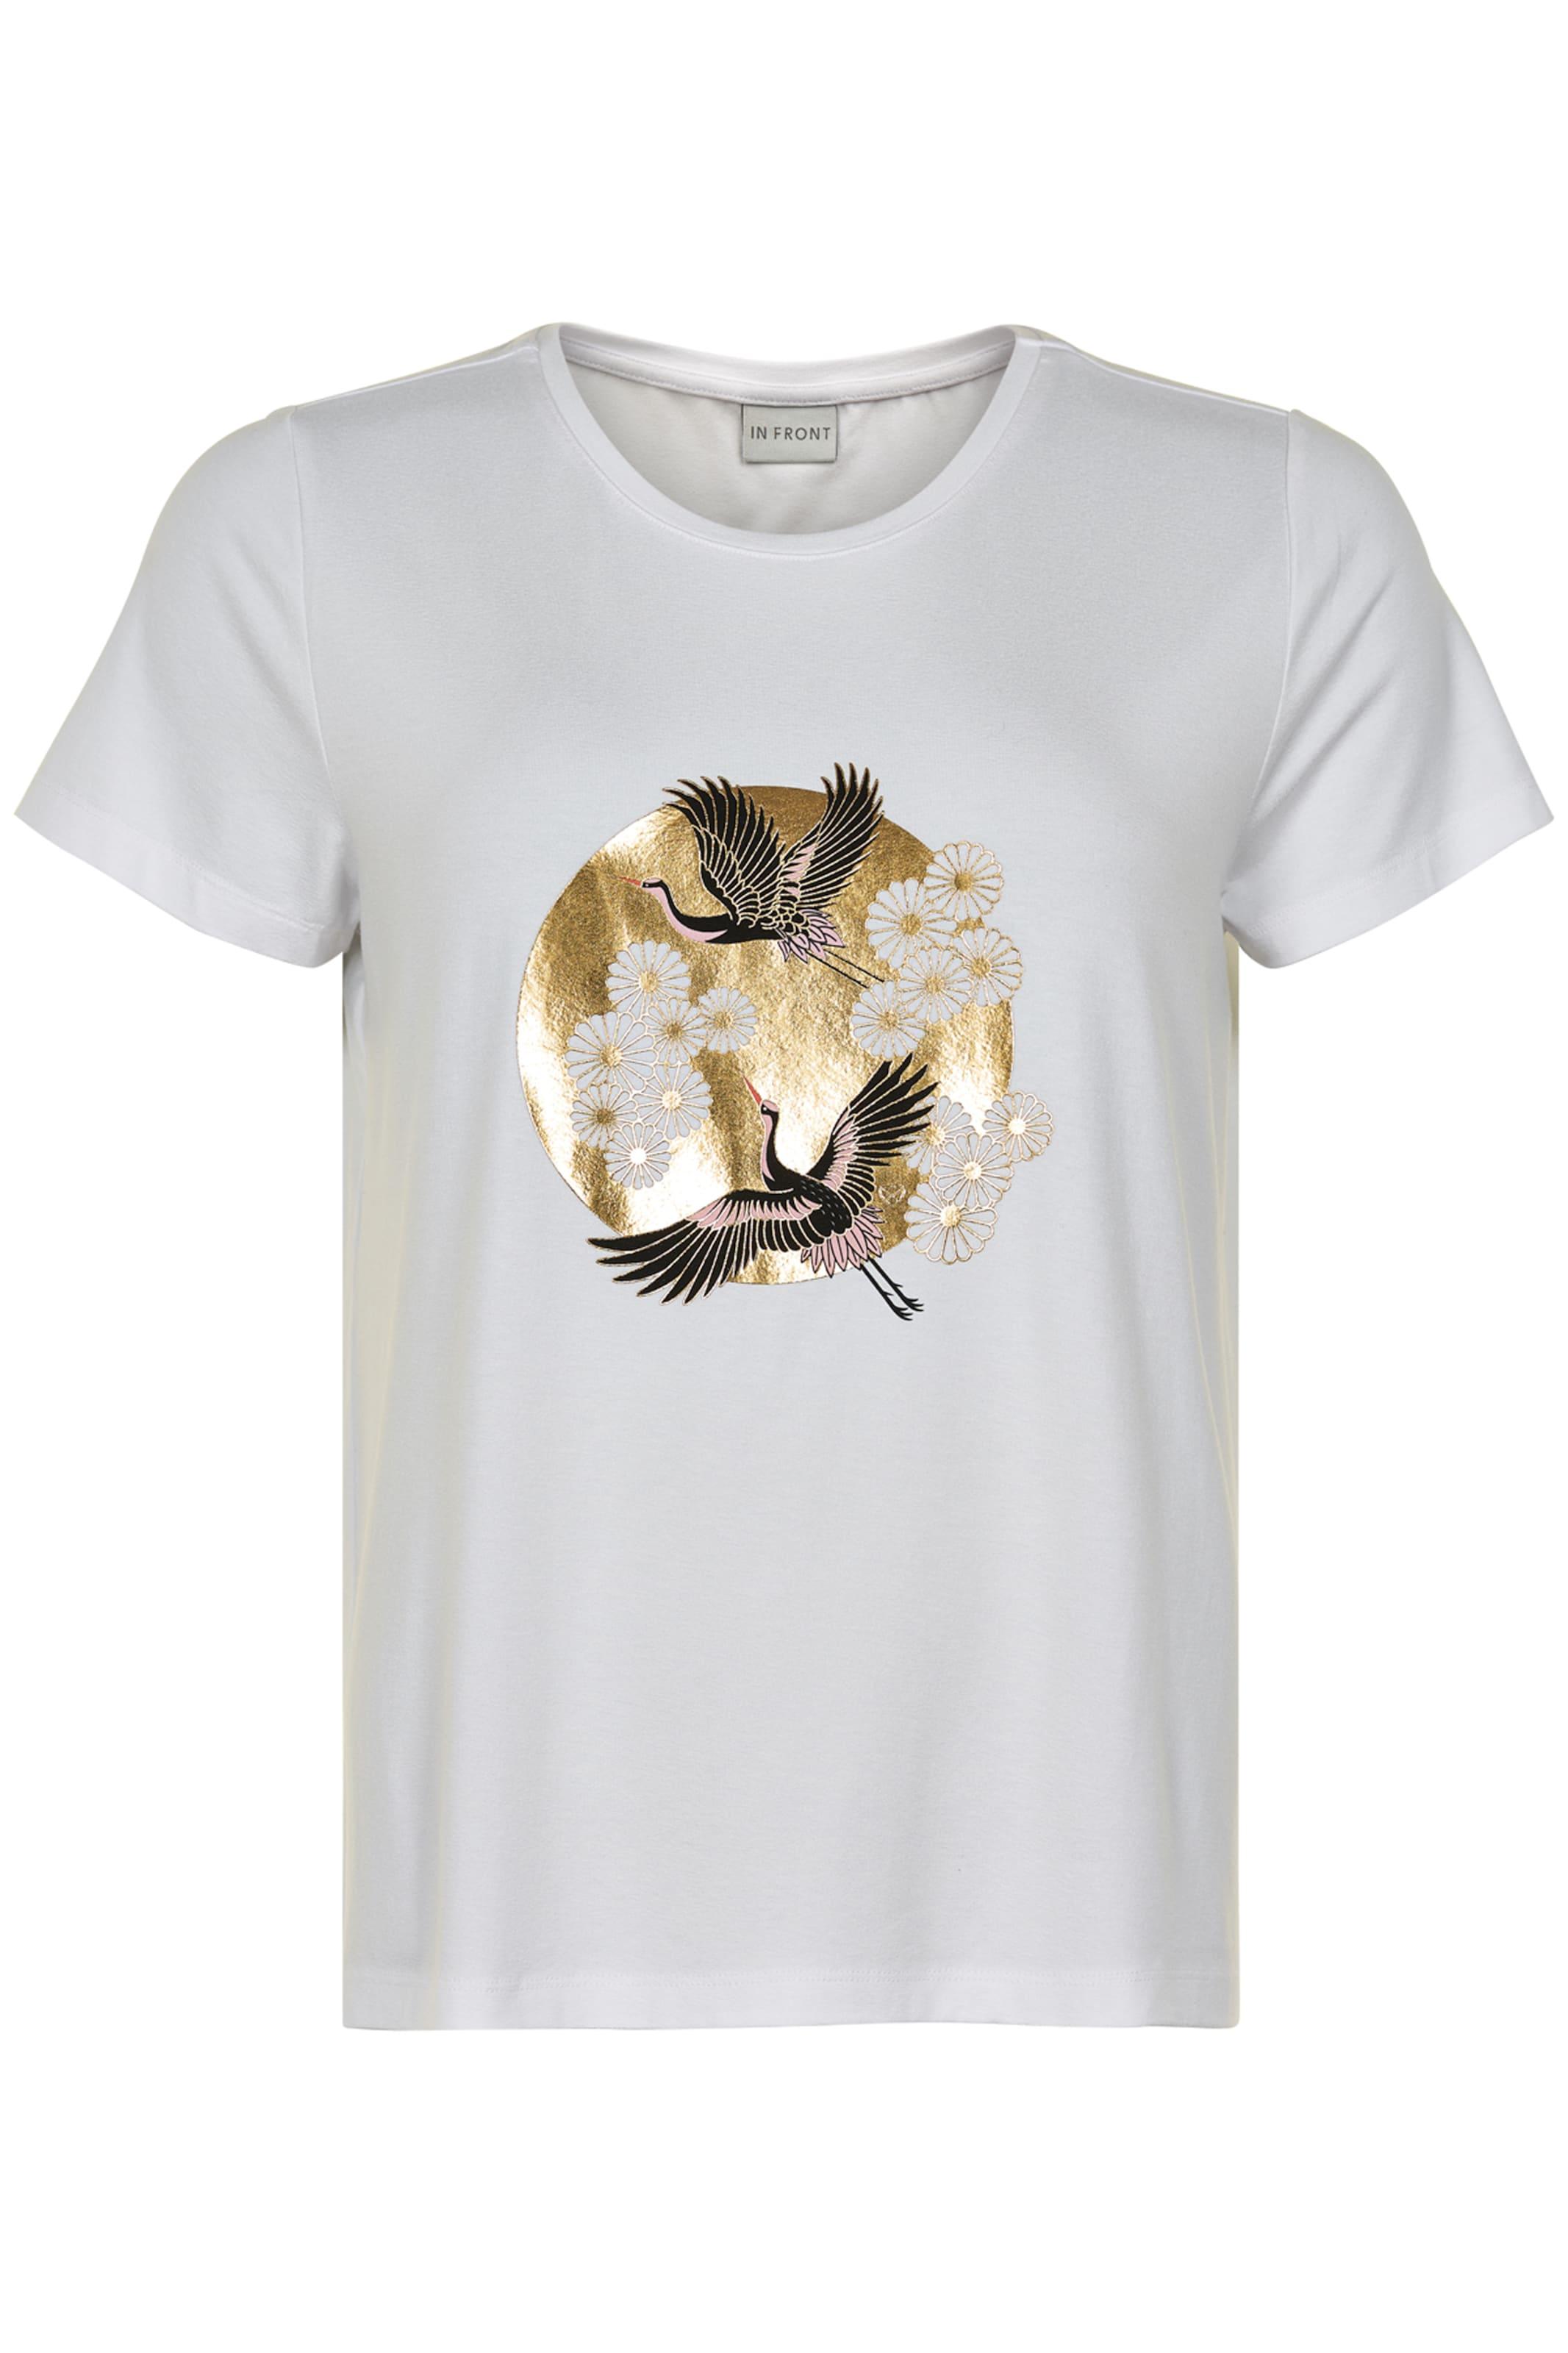 GoldSchwarz In Front shirt Weiß 'malla' T b7vf6gYy